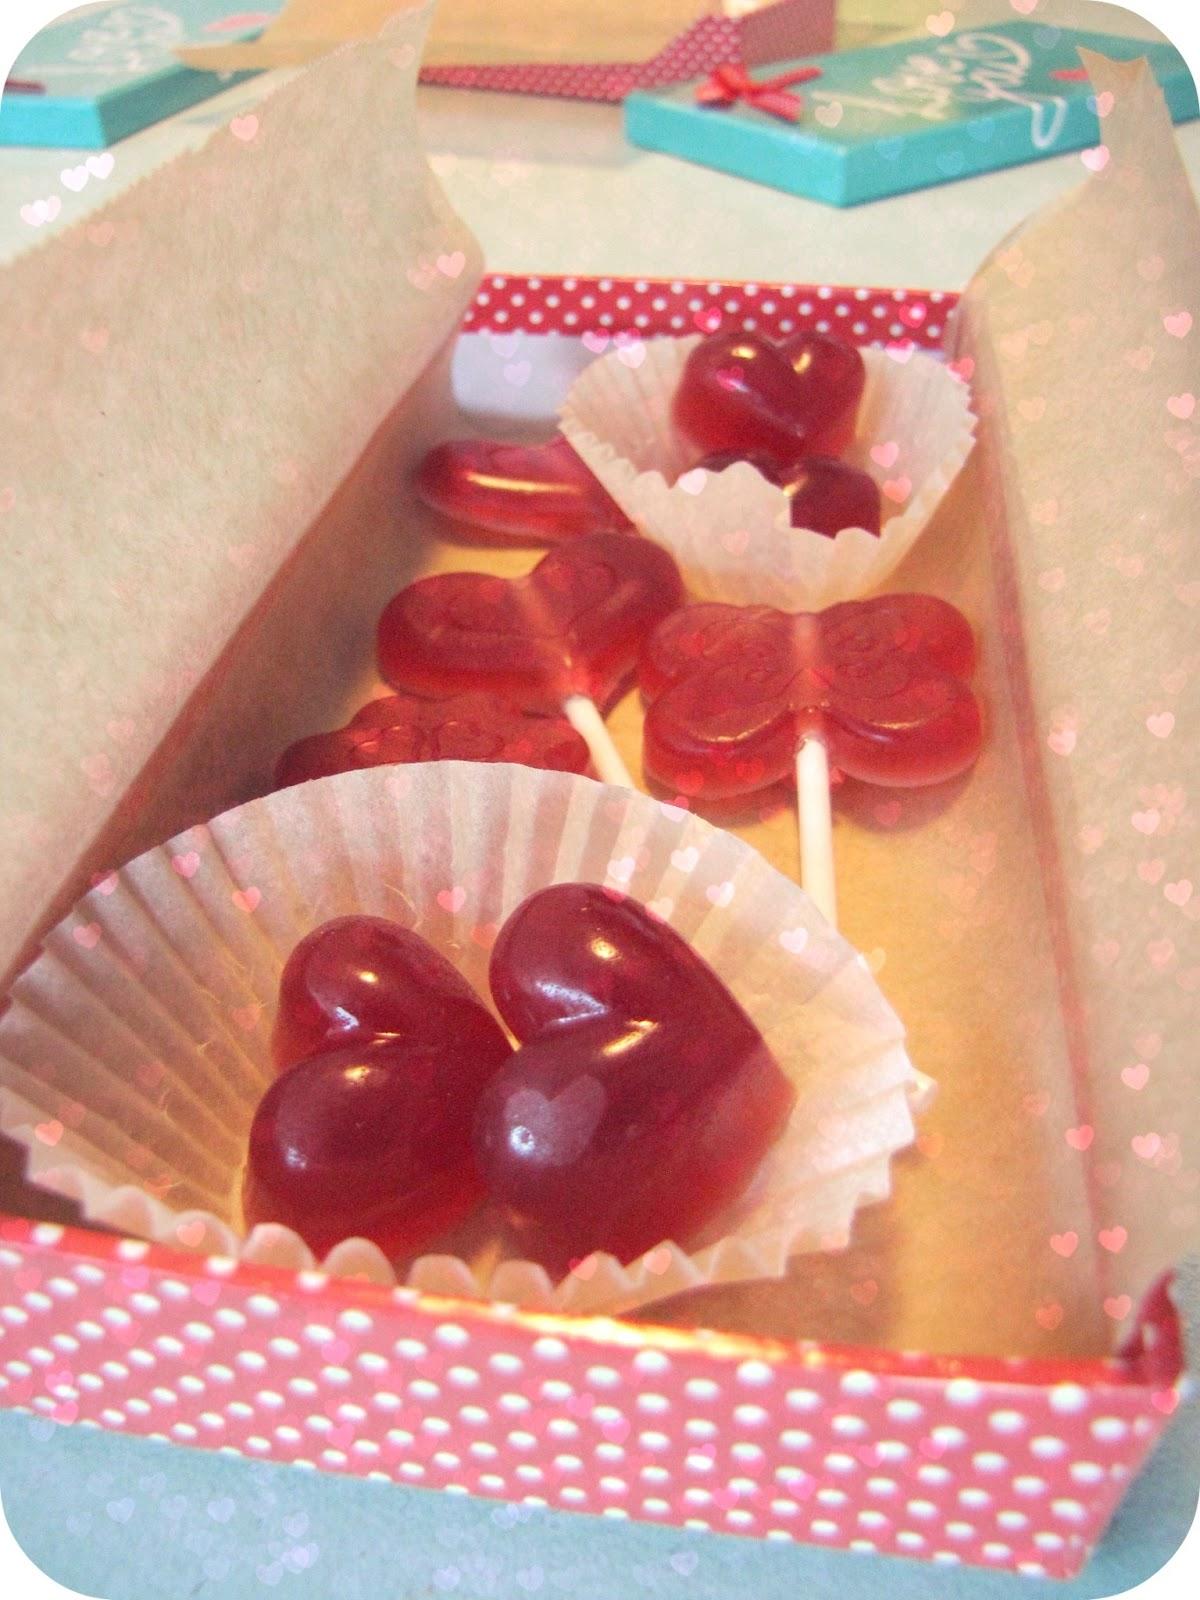 Paleo valentine s day meal ideas - Raspberry Lemon Gummy Hearts Lollipops